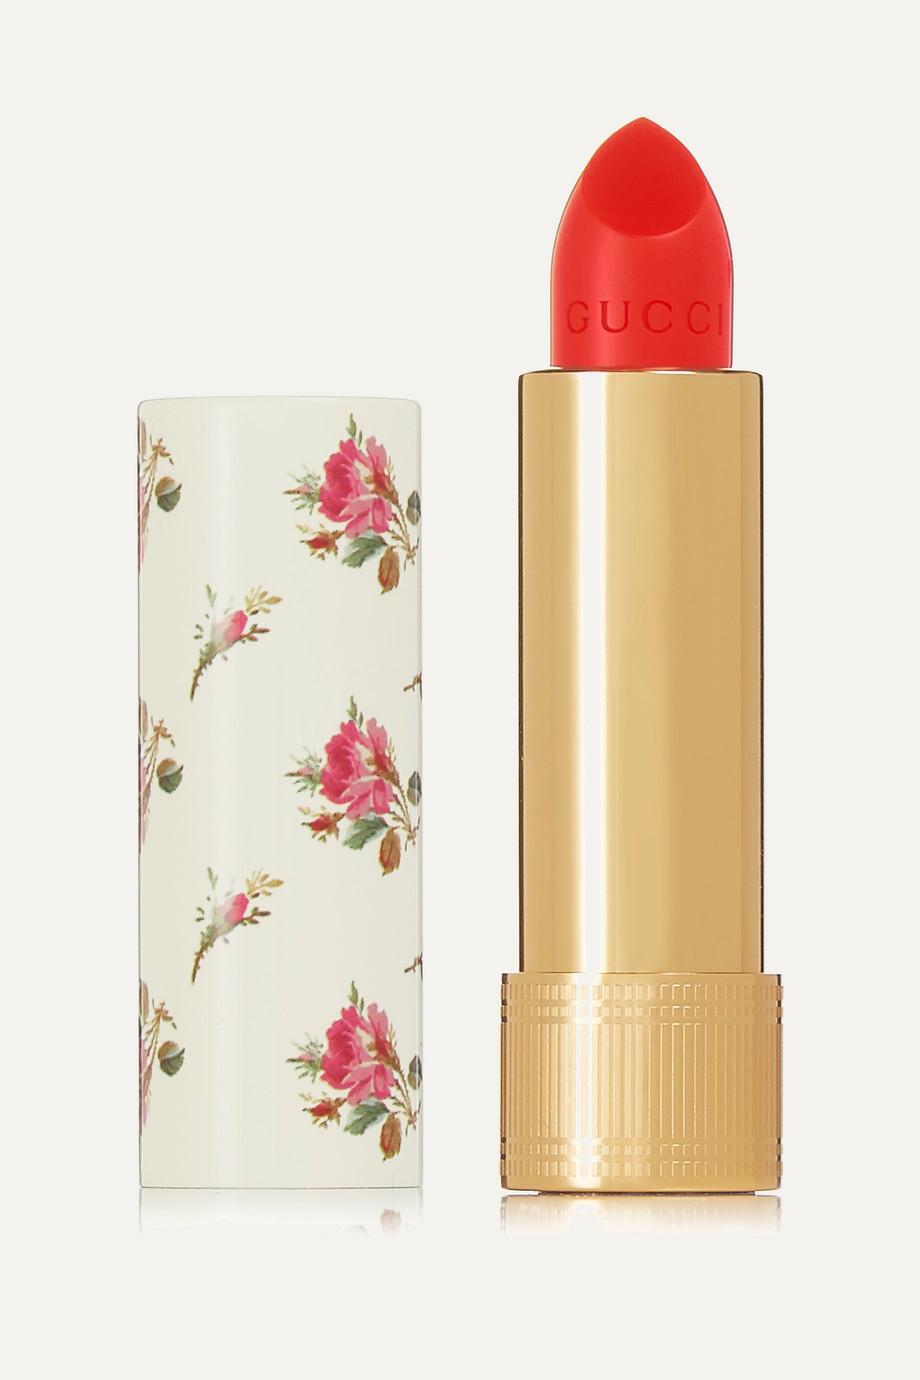 Gucci Beauty Rouge à Lèvres Voile - Odalie Red 500